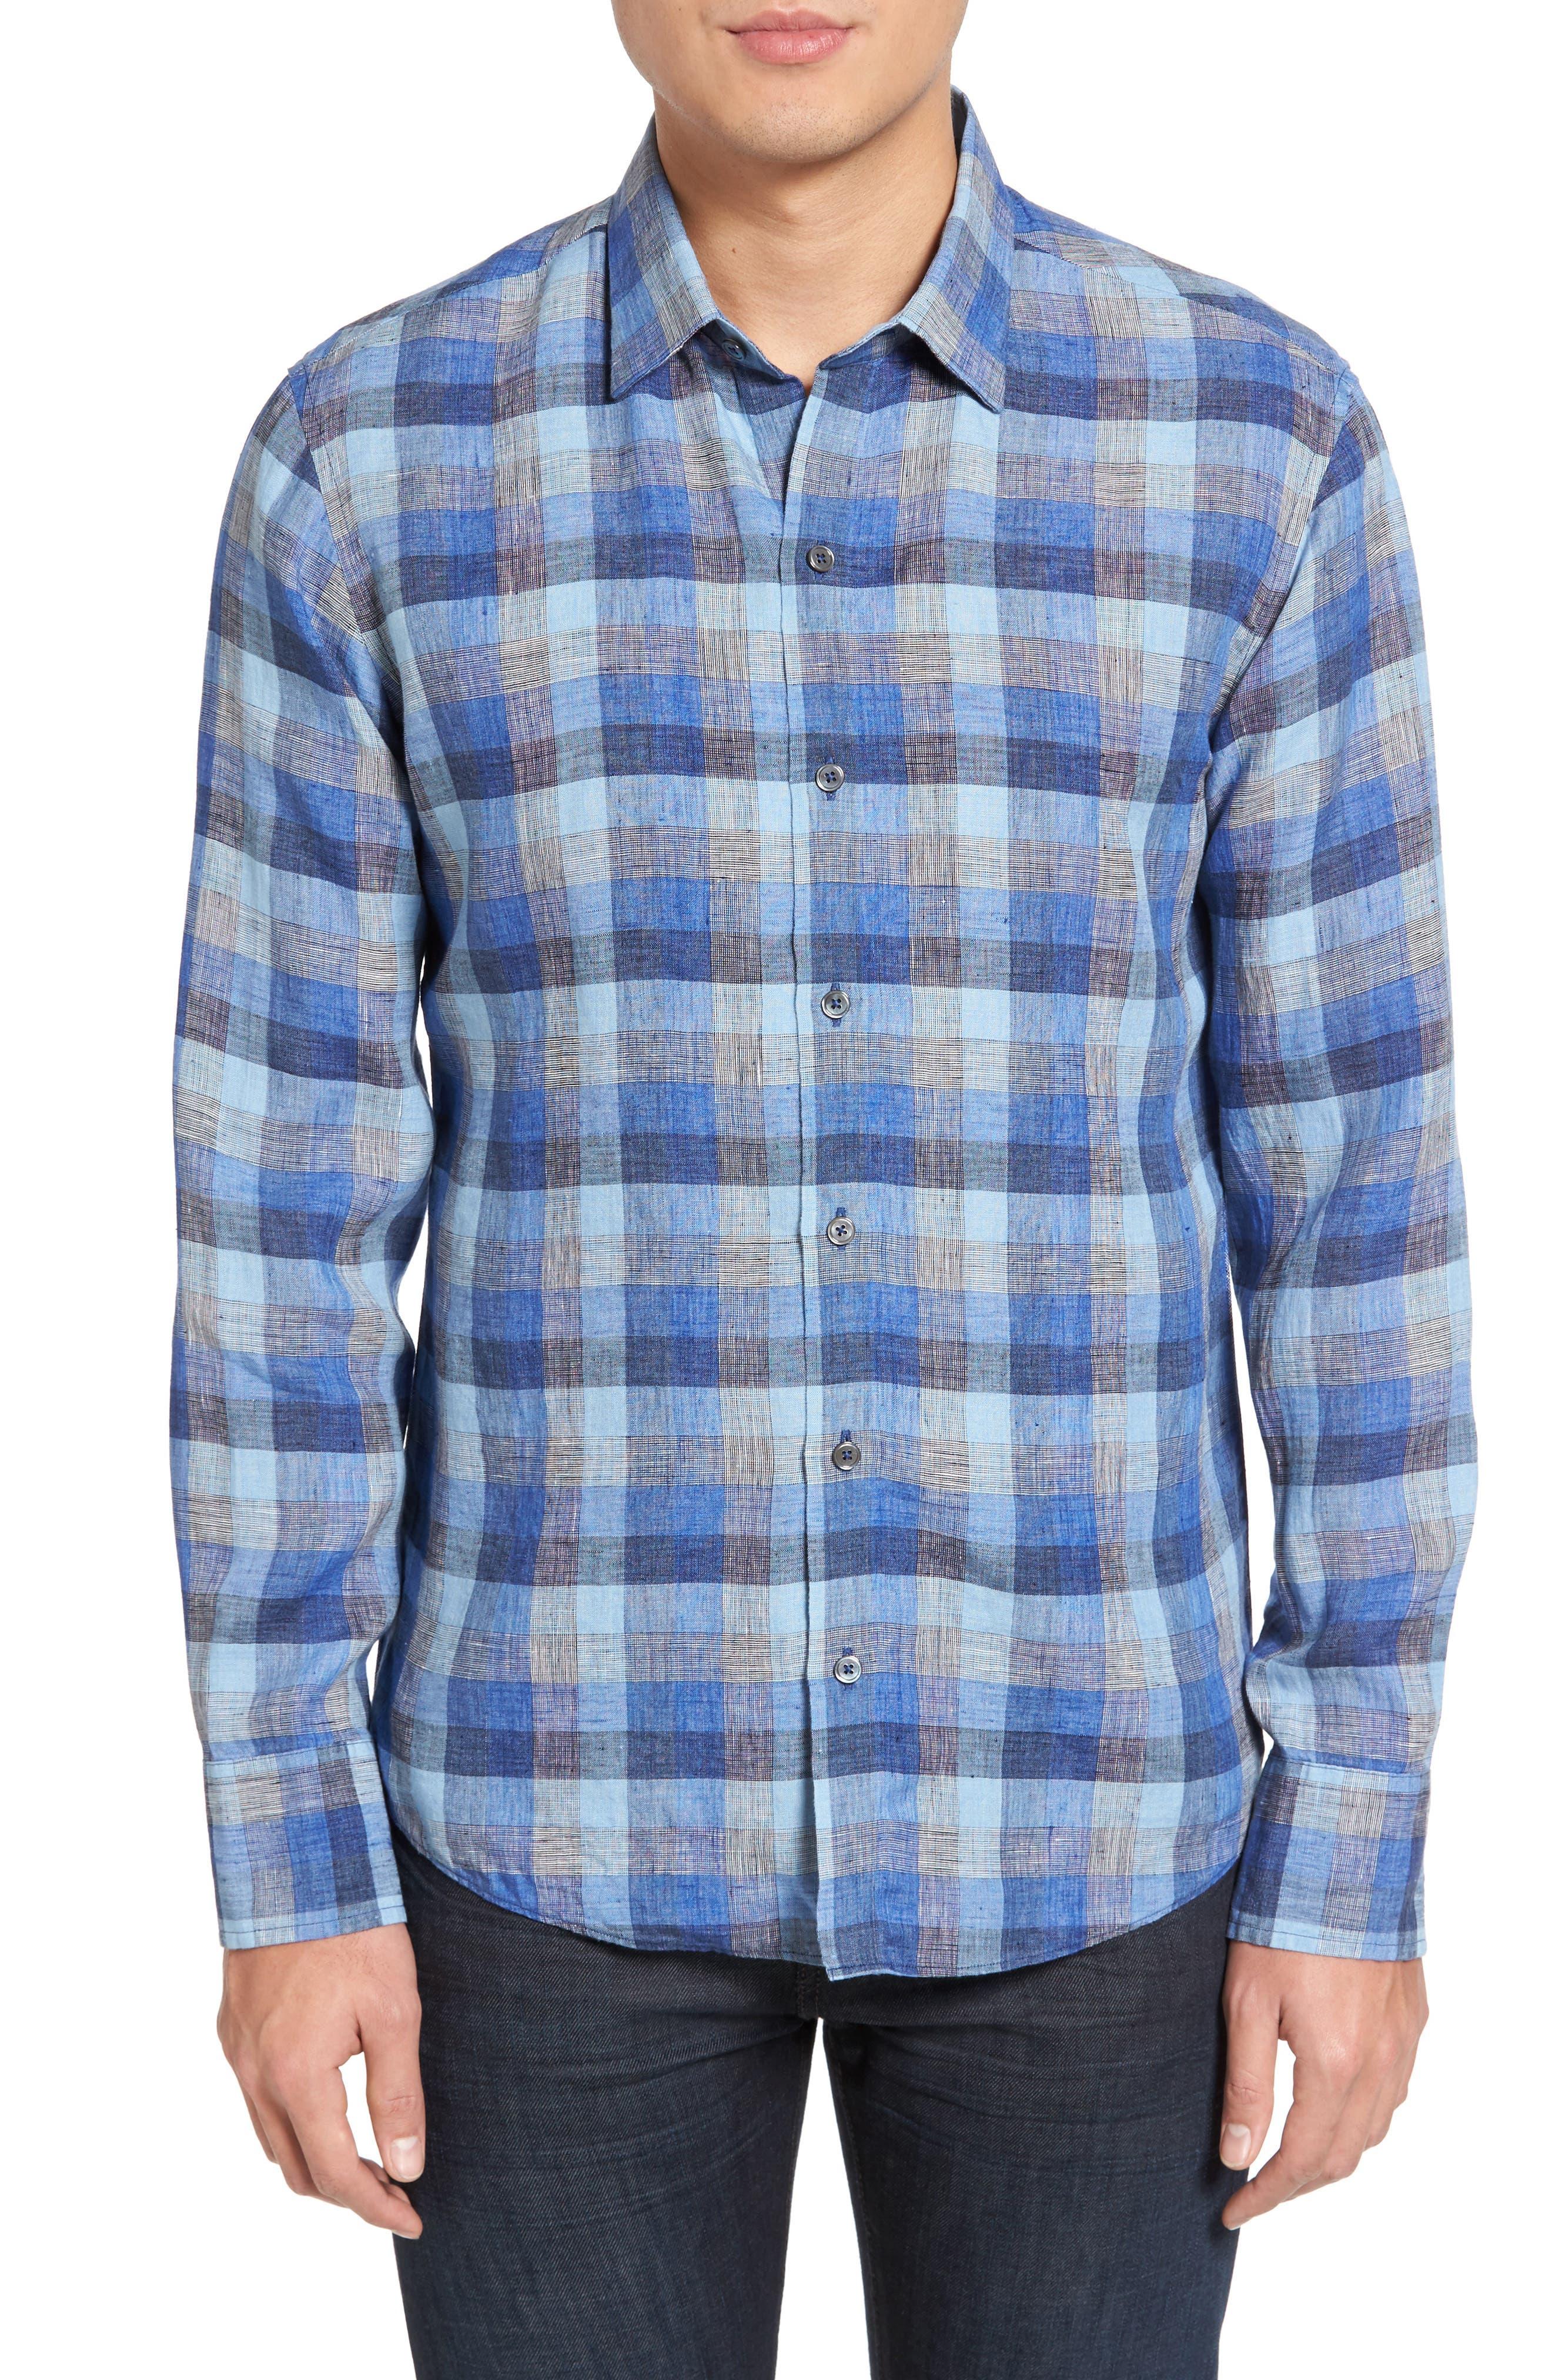 Kerner Plaid Sport Shirt,                             Main thumbnail 1, color,                             Blue